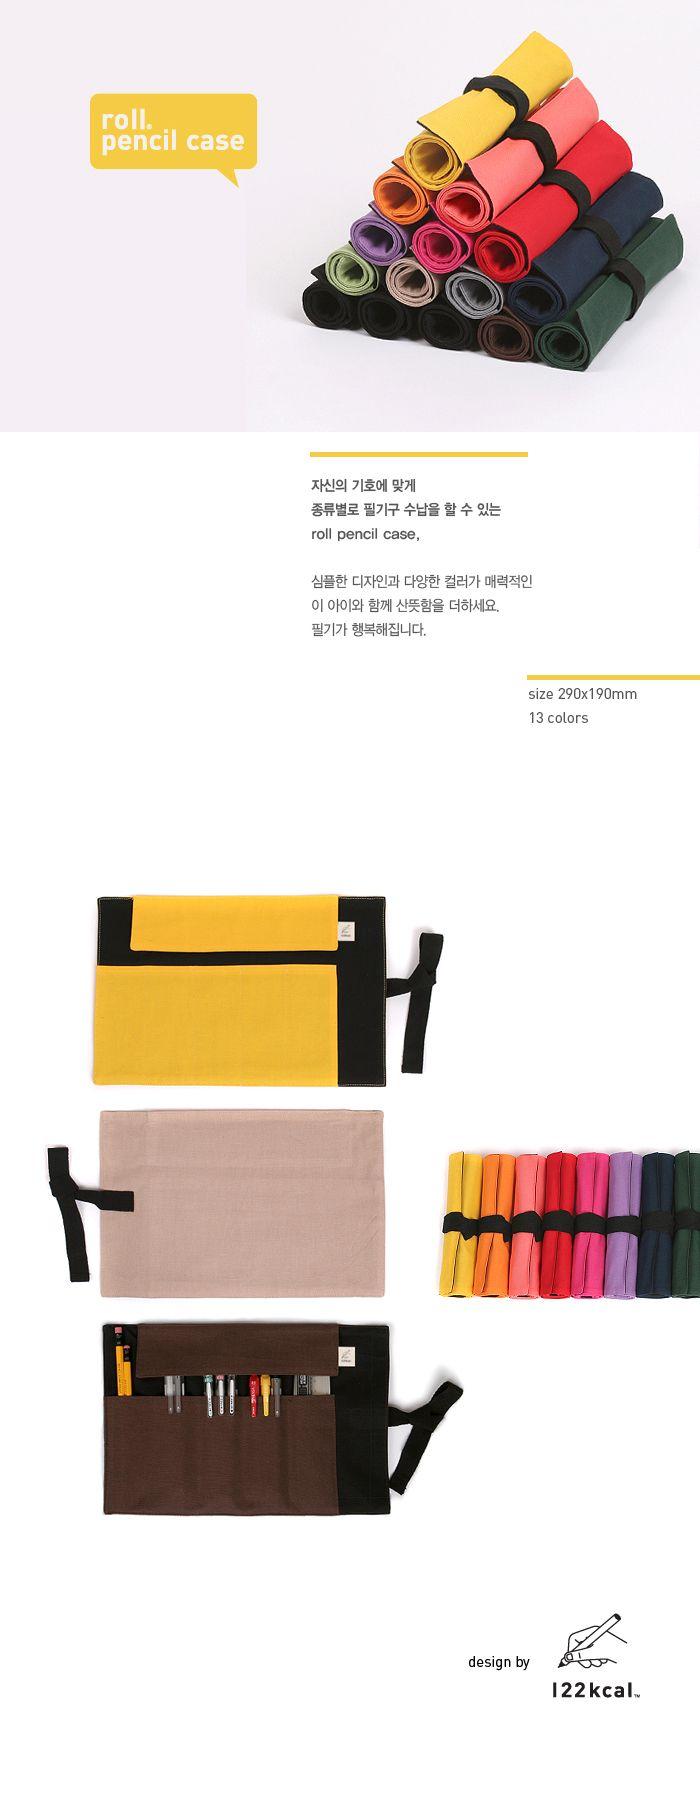 ARTBOX roll pencil case